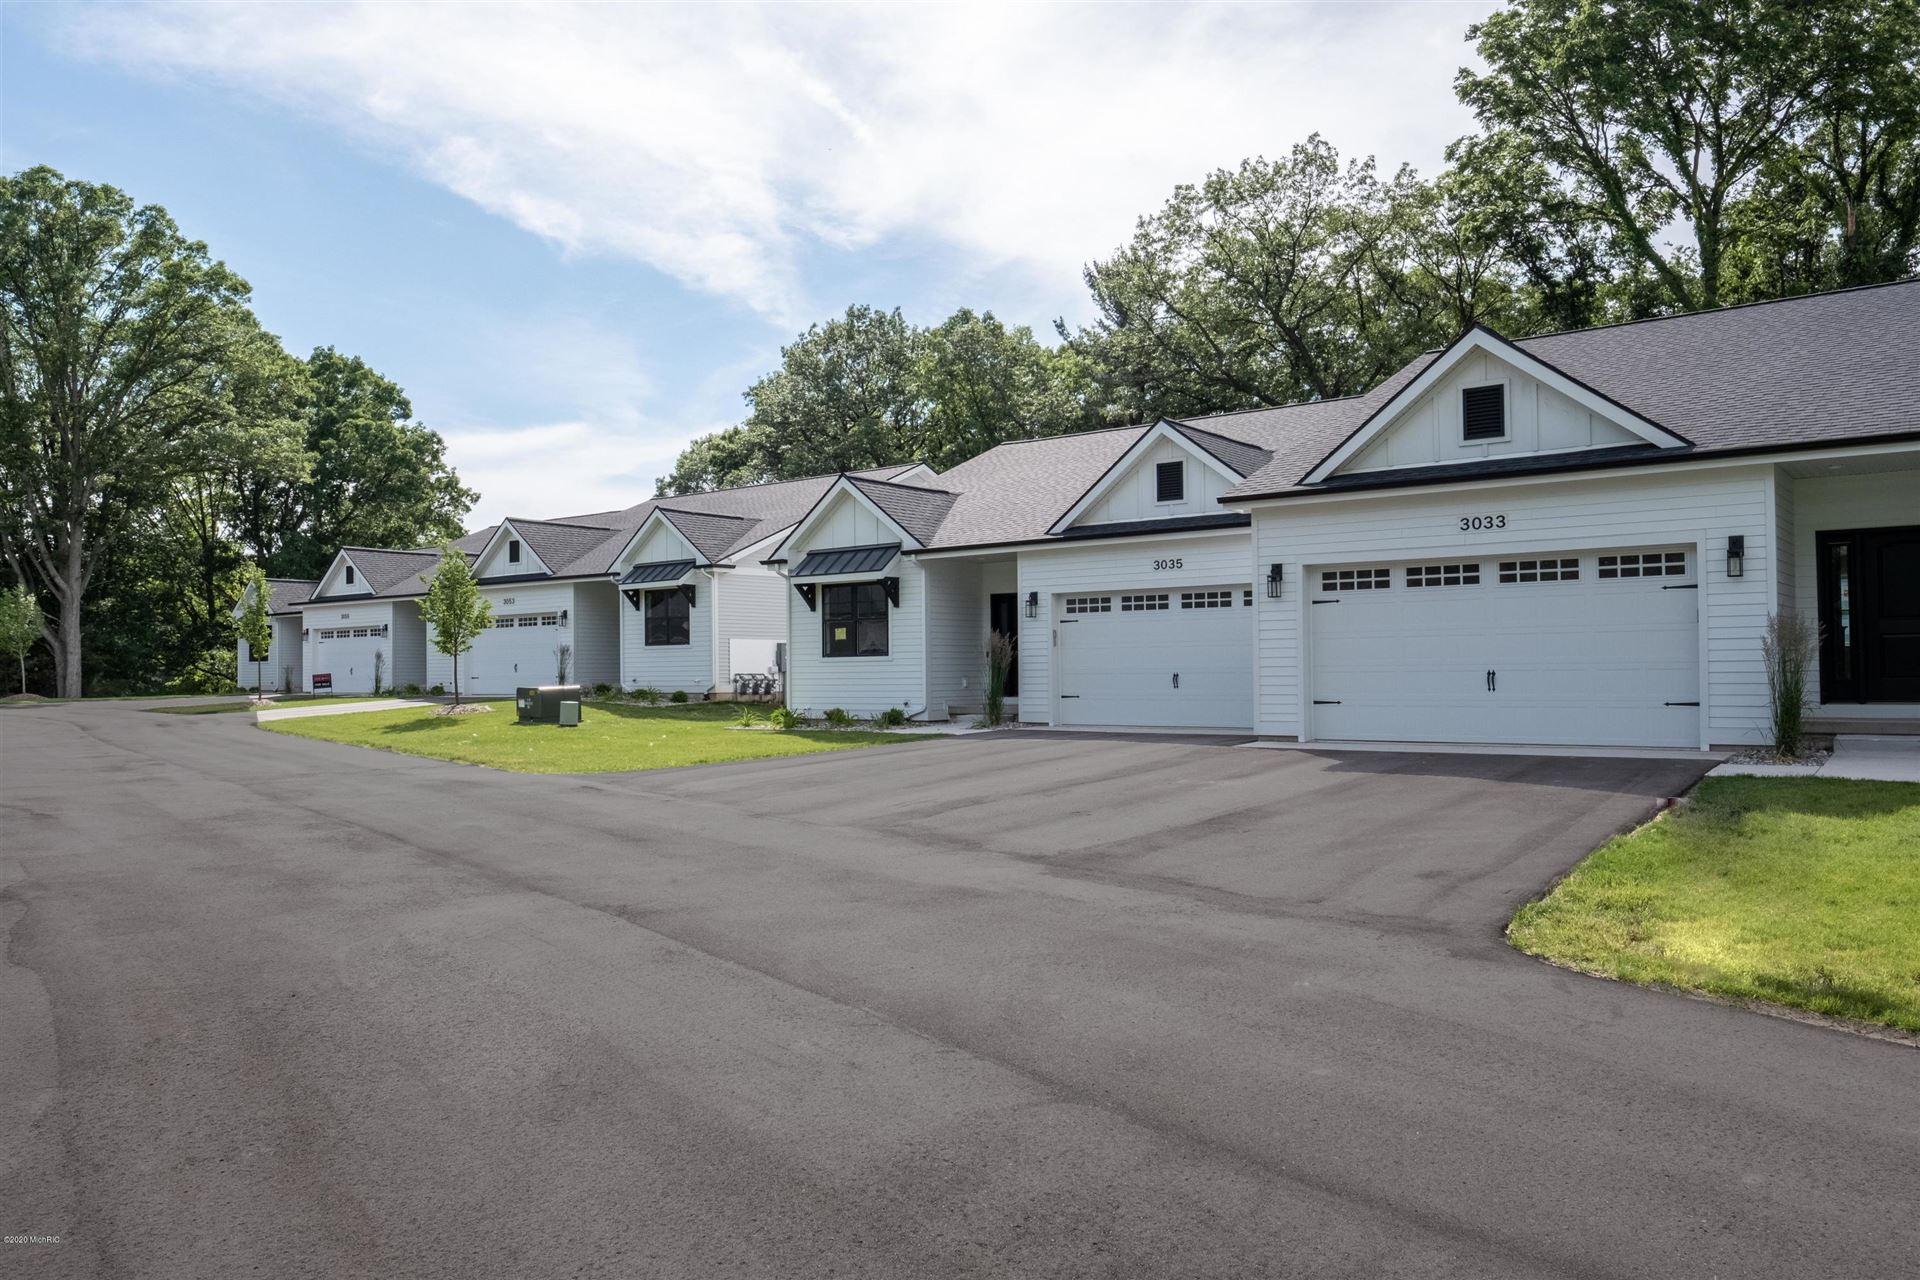 3033 West Bluffs Drive SE #2, Grand Rapids, MI 49546 - #: 20006559